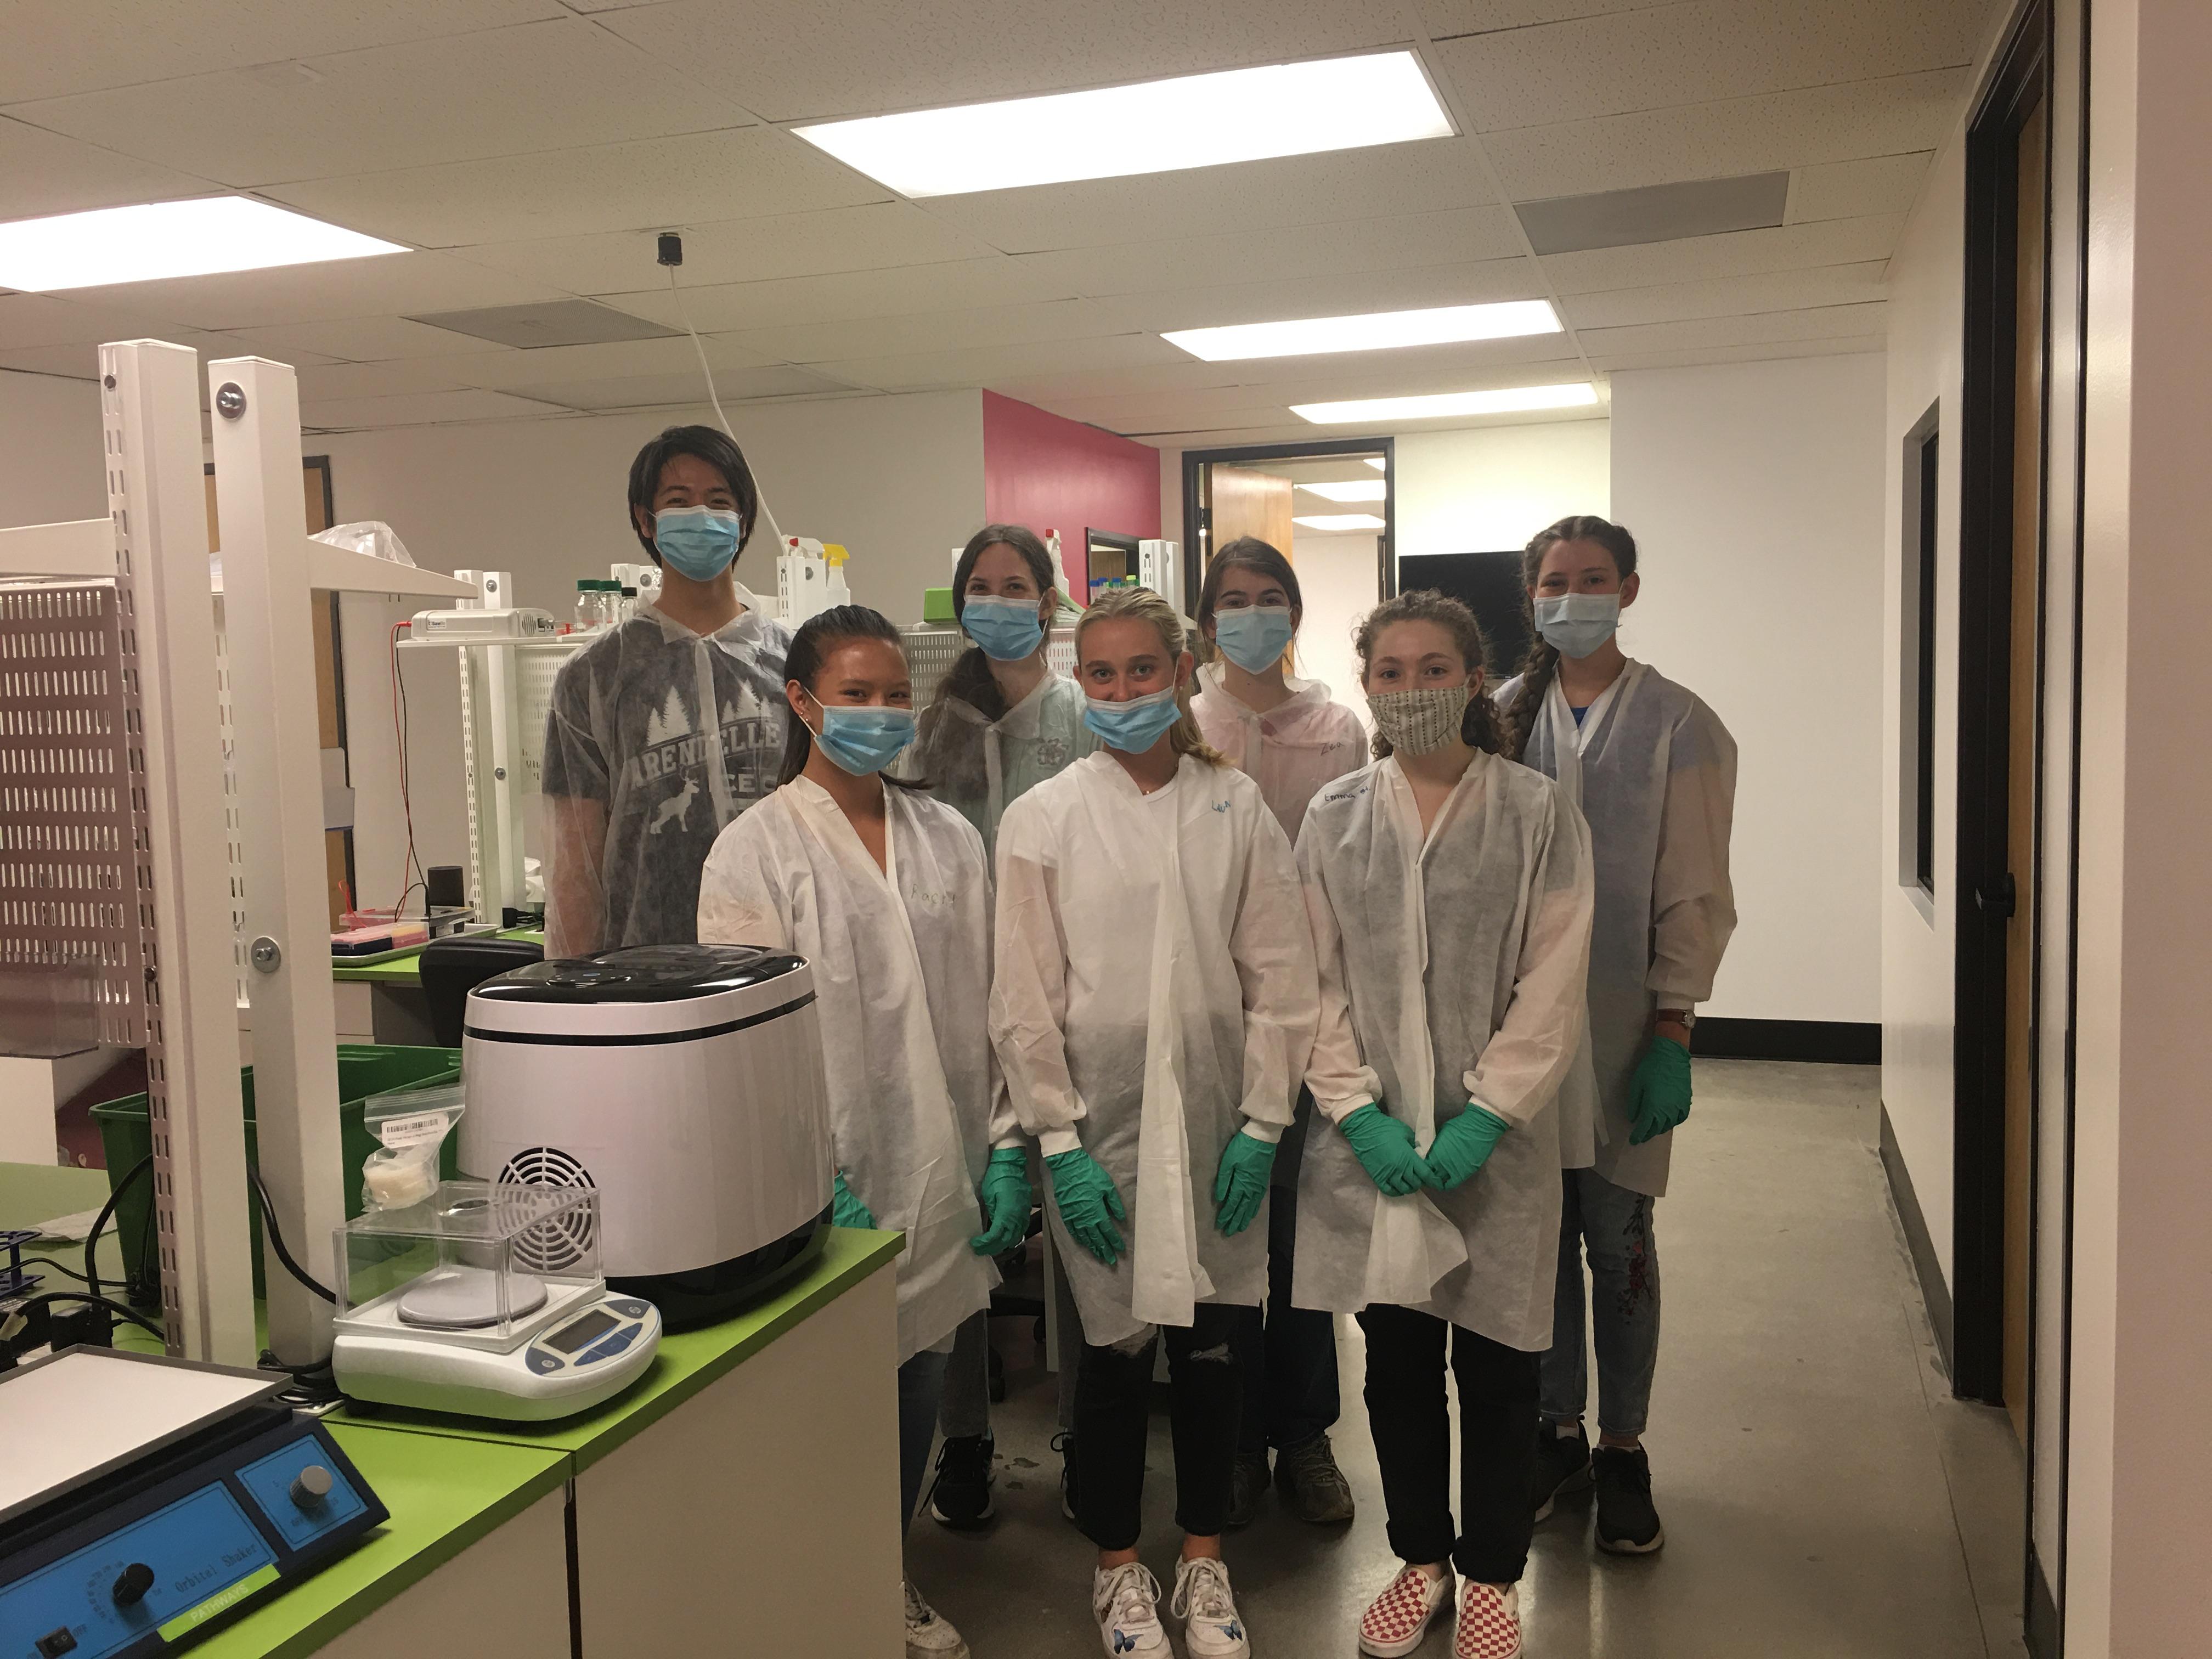 Summer Program - Veterinary Medicine | Regenerative Medicine and Disease Modeling